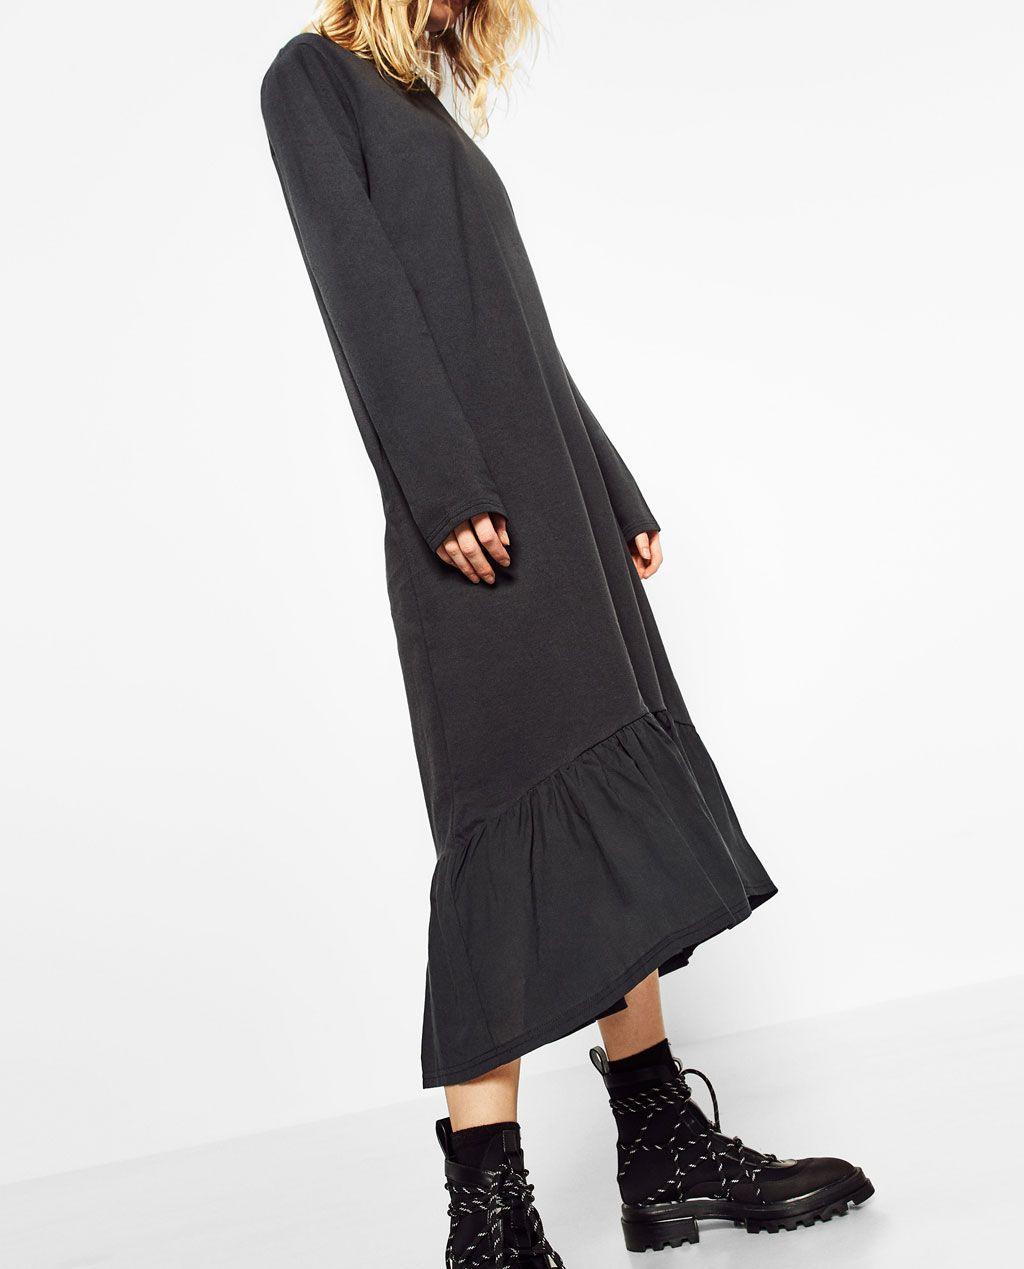 Zara  Sale  Long Dress With Hem Frill  Frau Damen